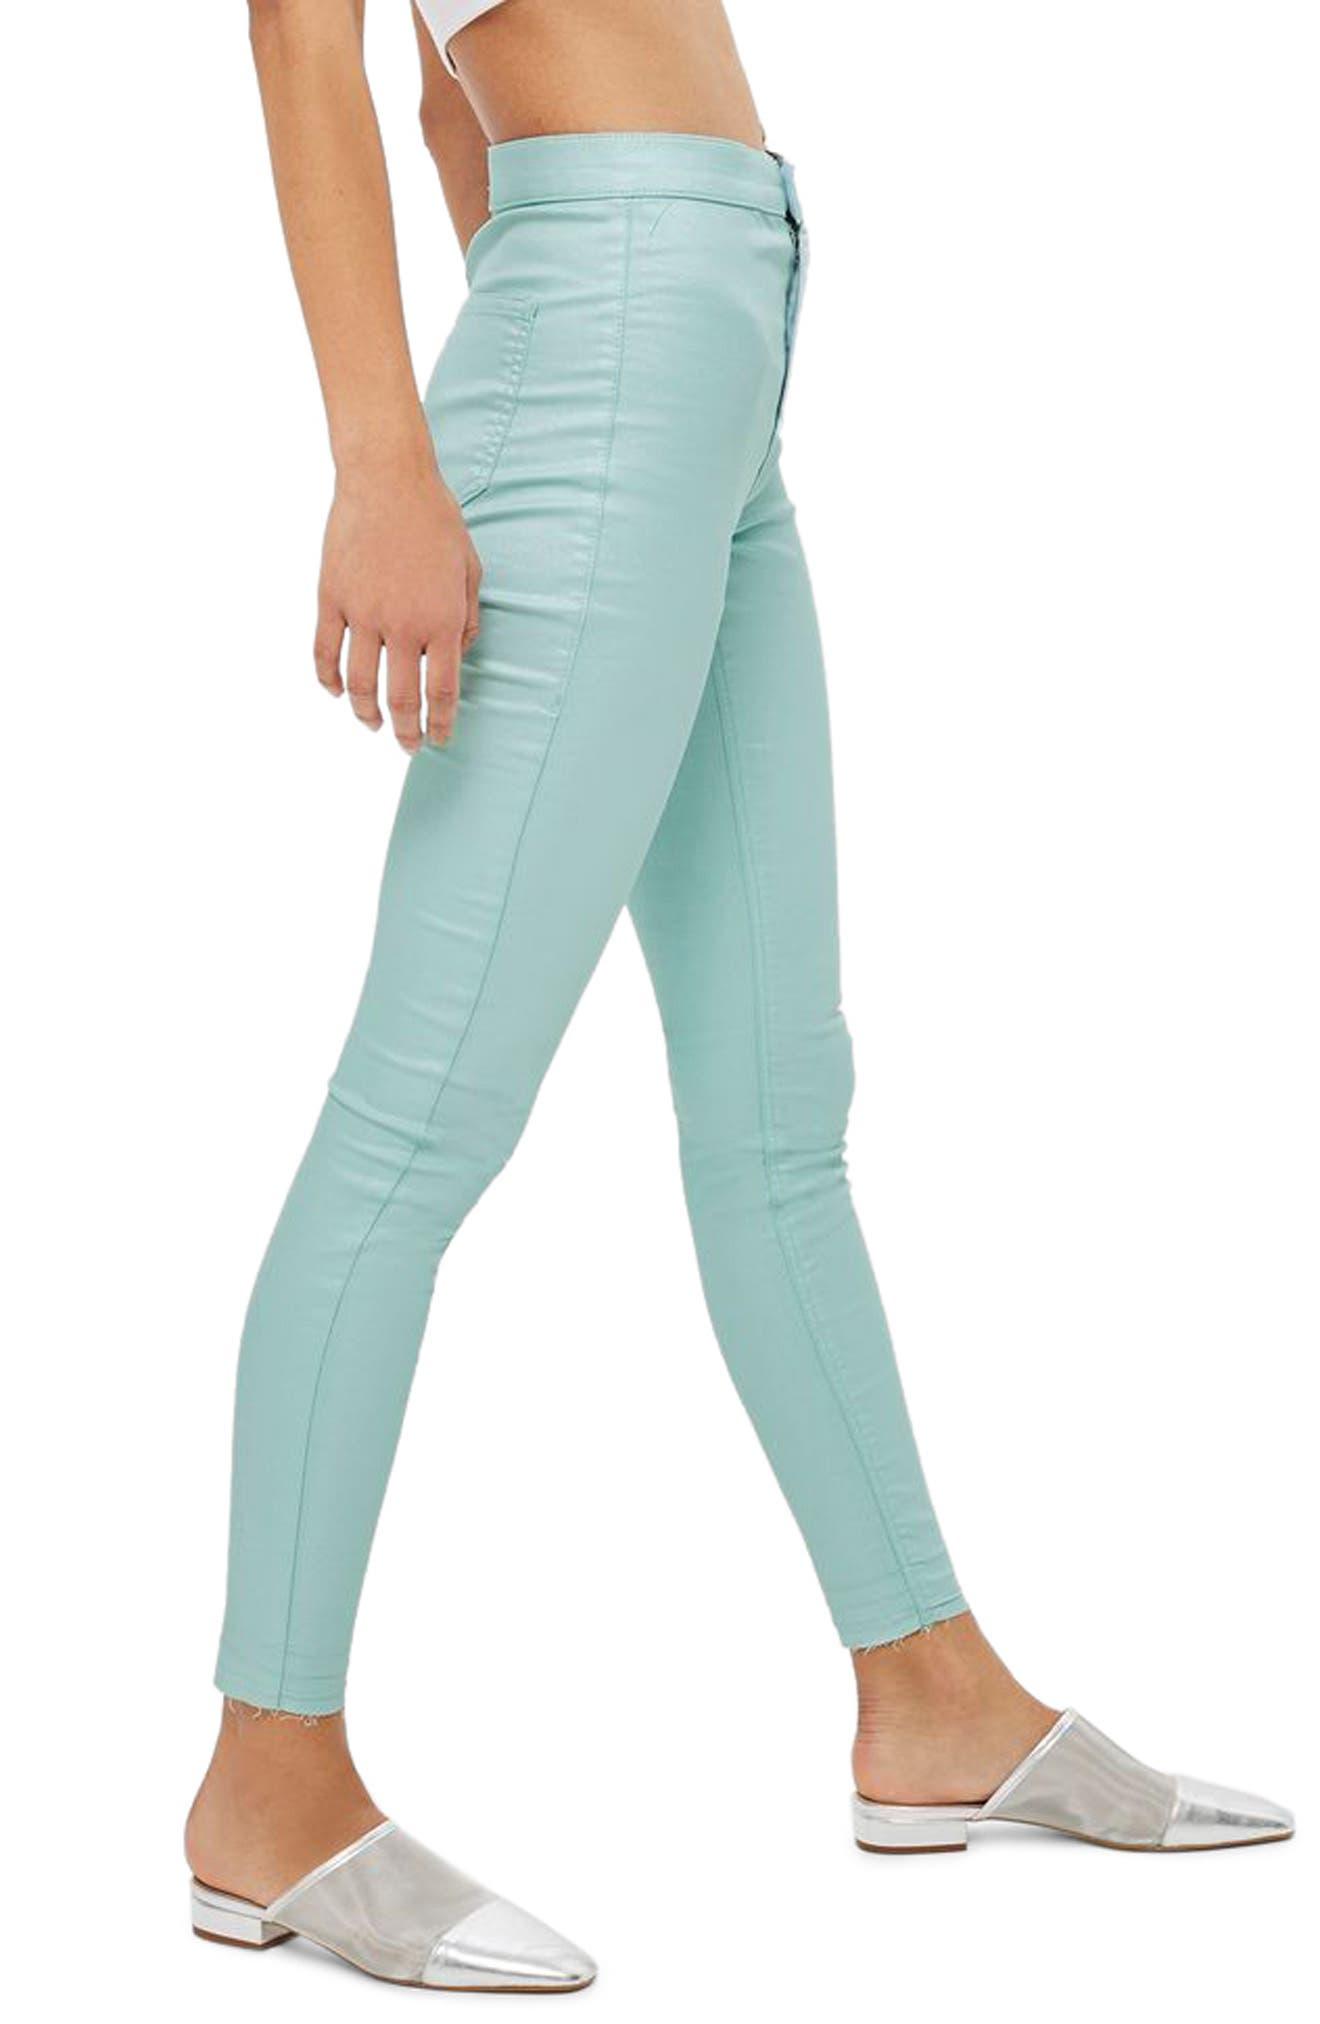 Joni Shimmer Skinny Jeans,                         Main,                         color, Mint